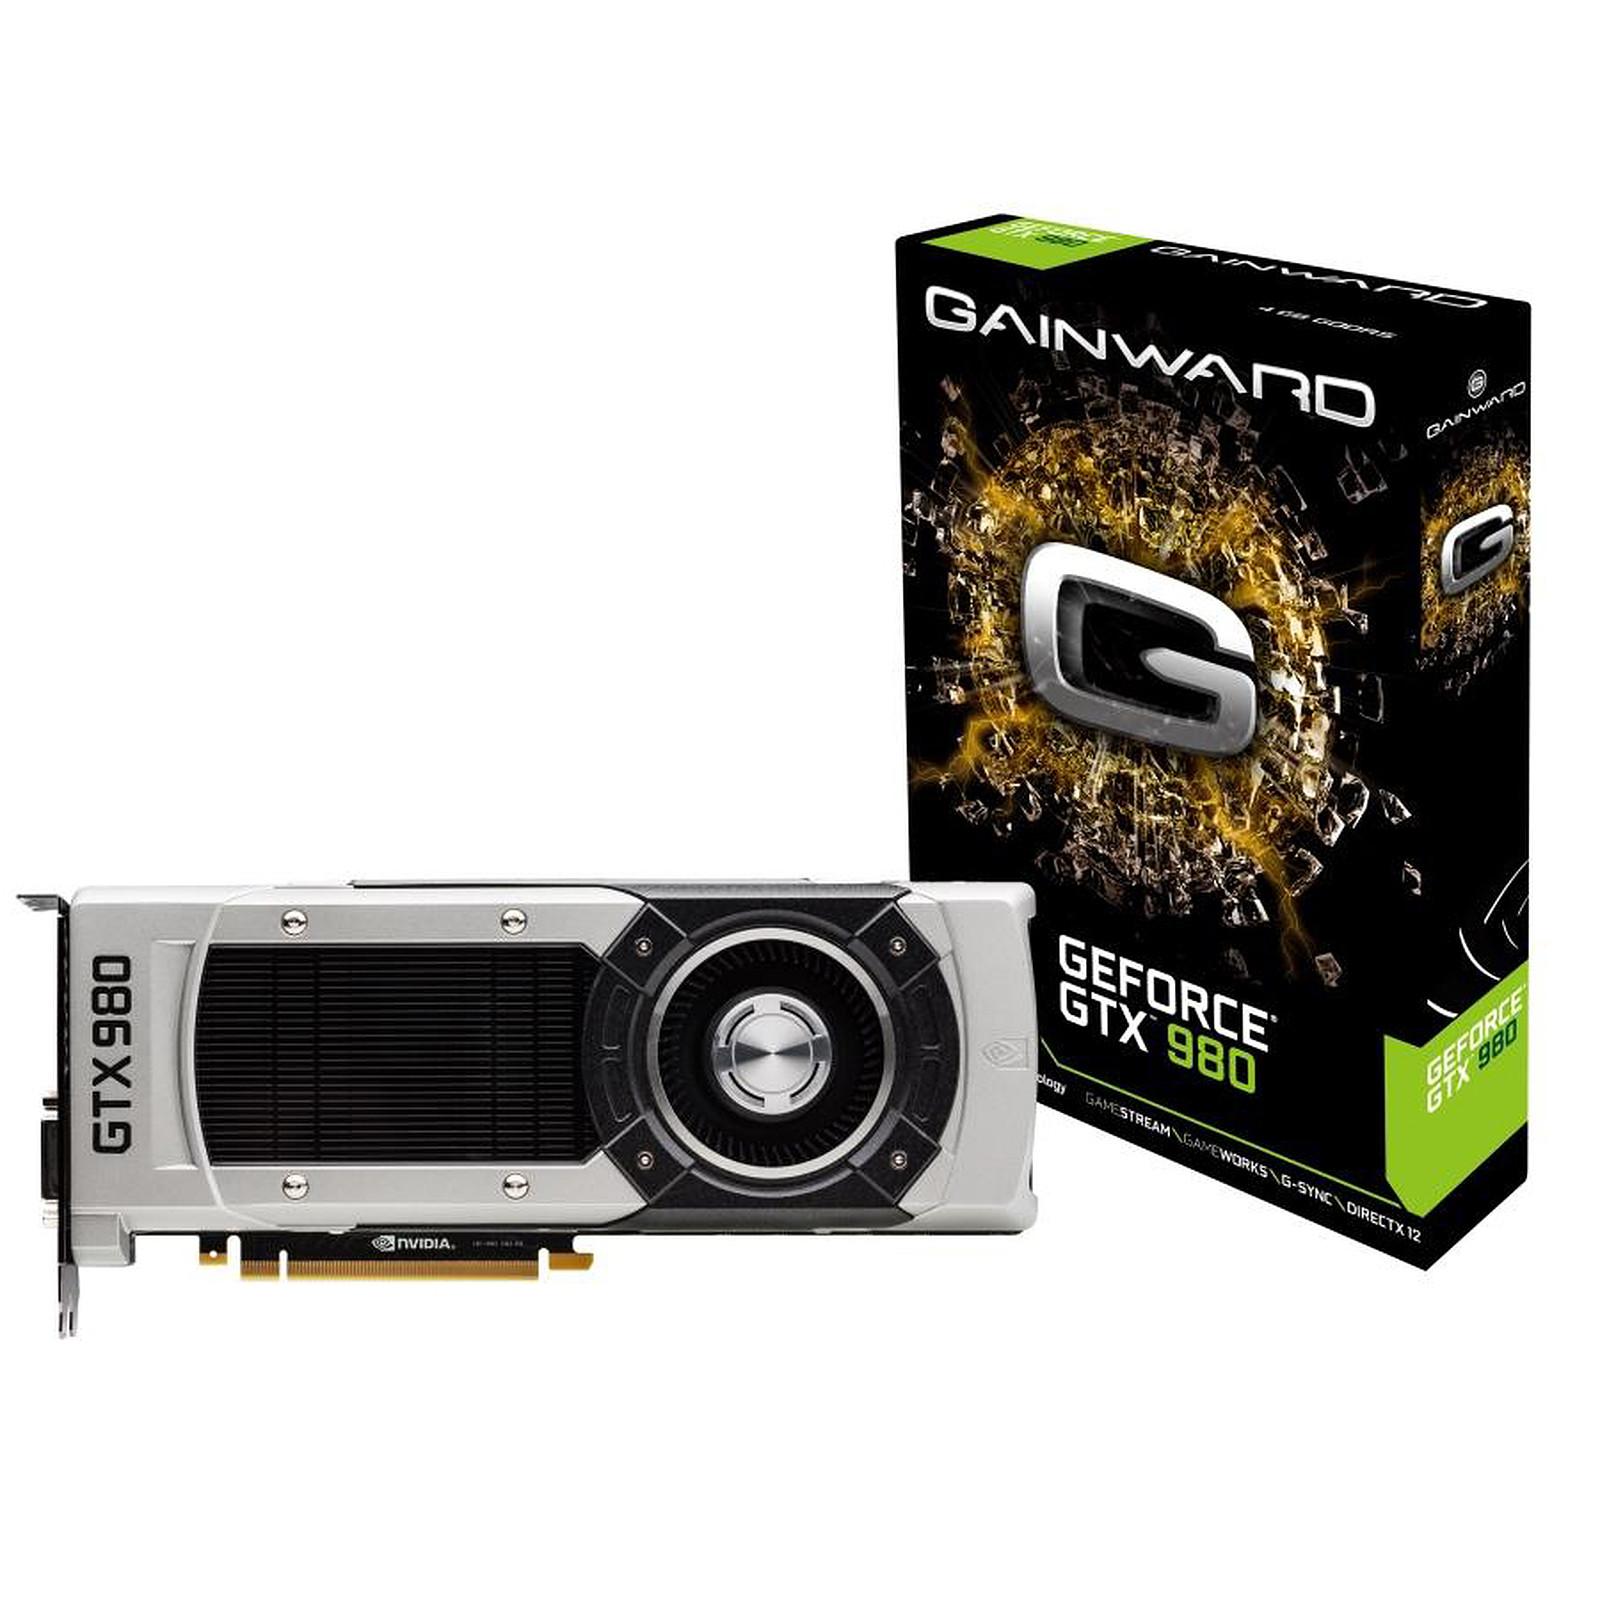 Gainward GeForce GTX 980 4096MB